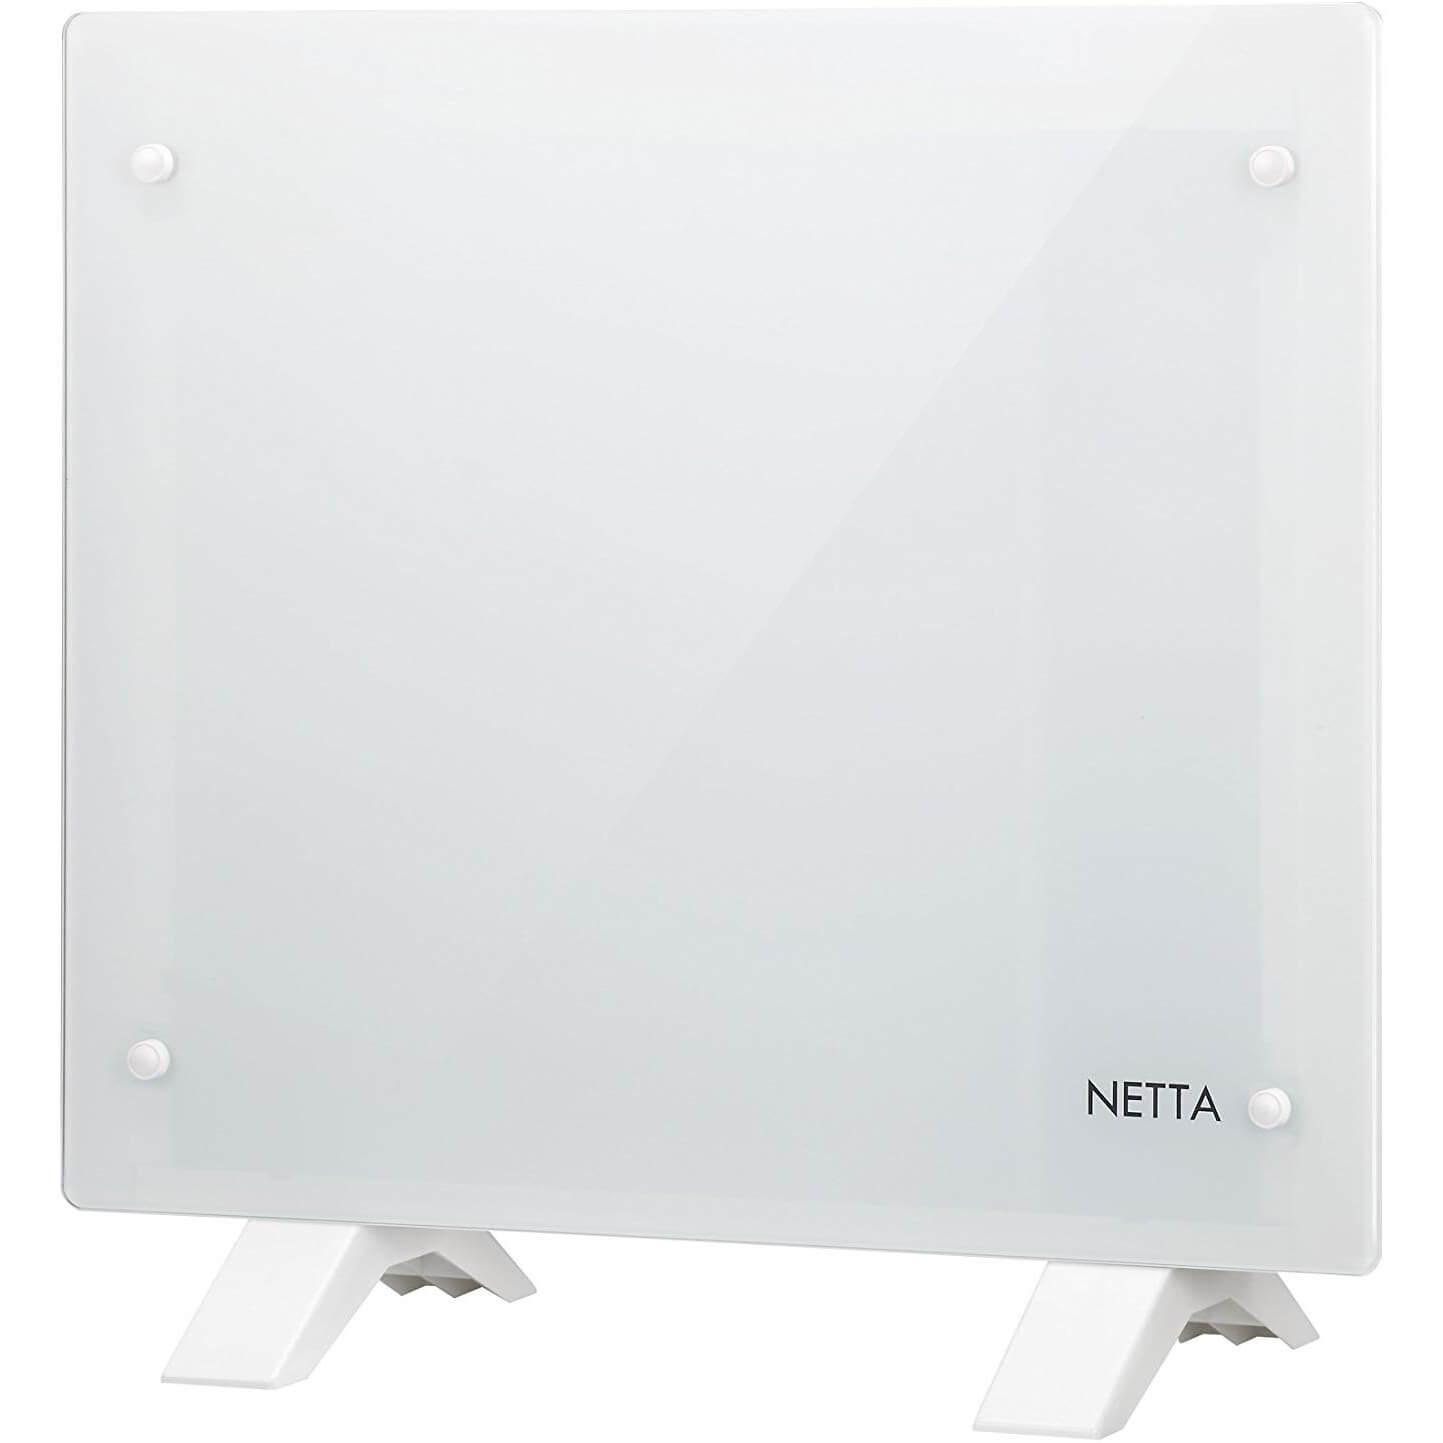 NETTA Electric Panel Heater